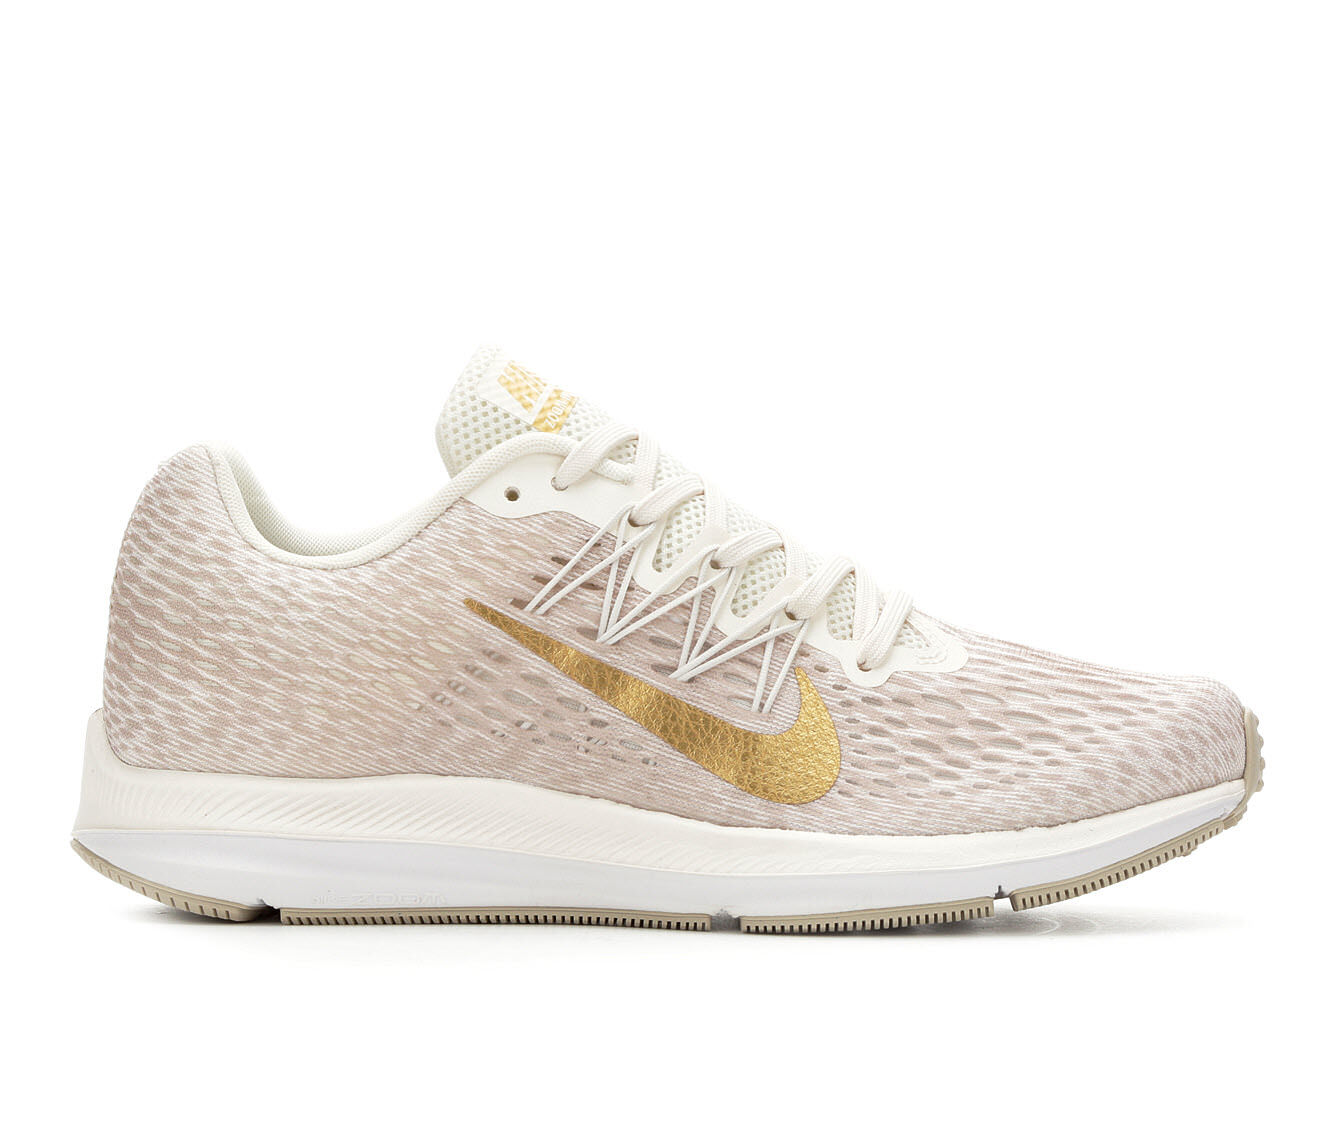 Massive discount Women's Nike Zoom Winflo 5 Running Shoes Phantom/Gld/Wht